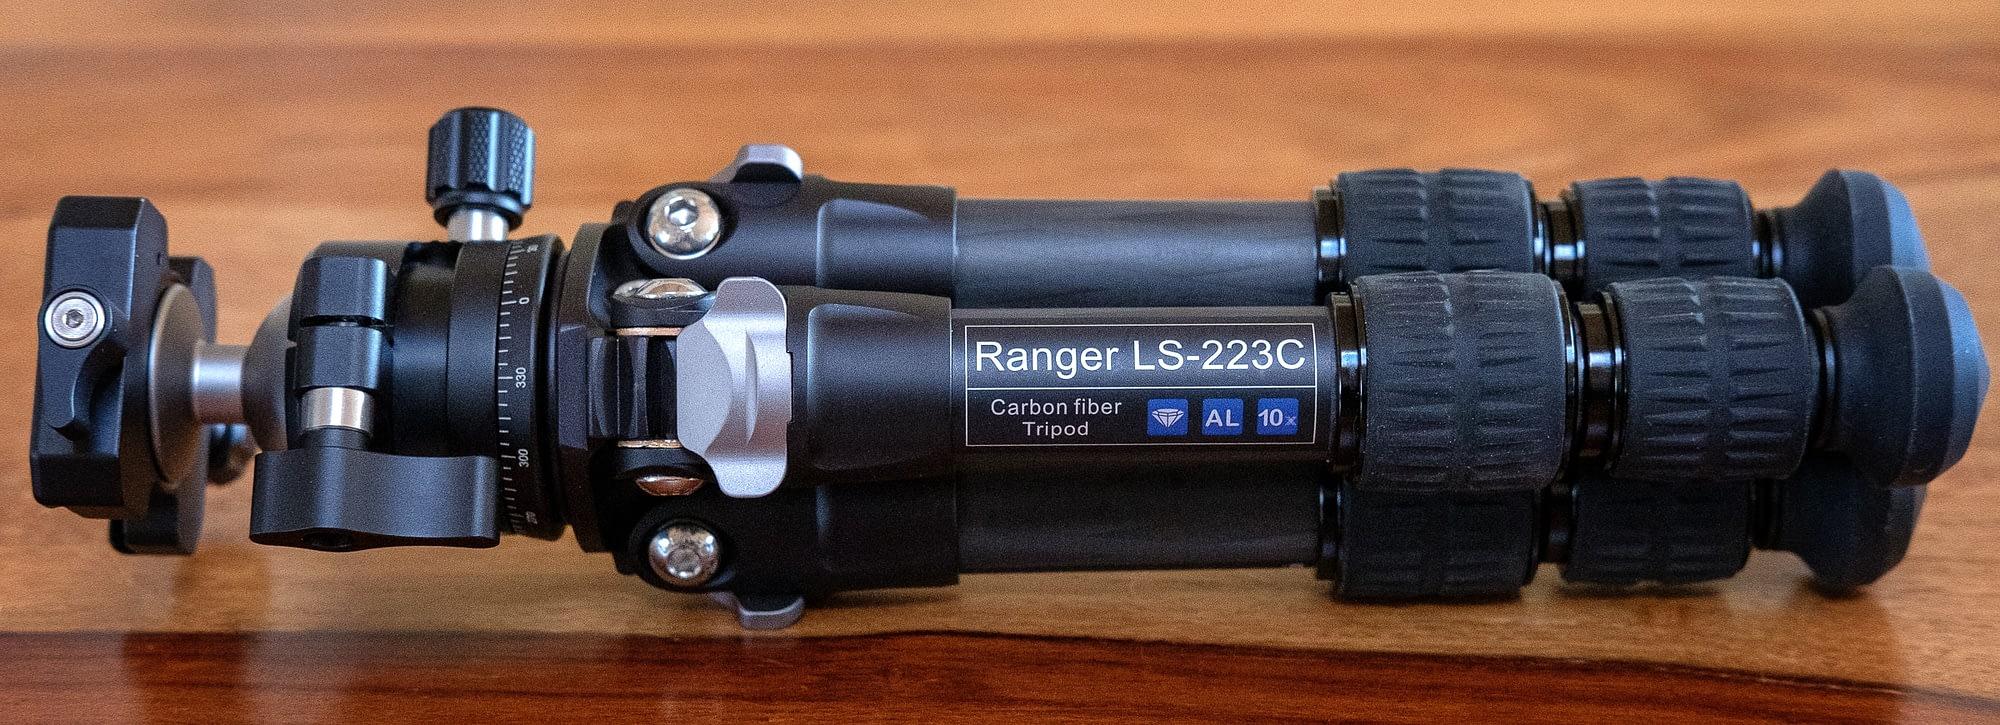 Leofoto LS-223C Mini Tripod Review